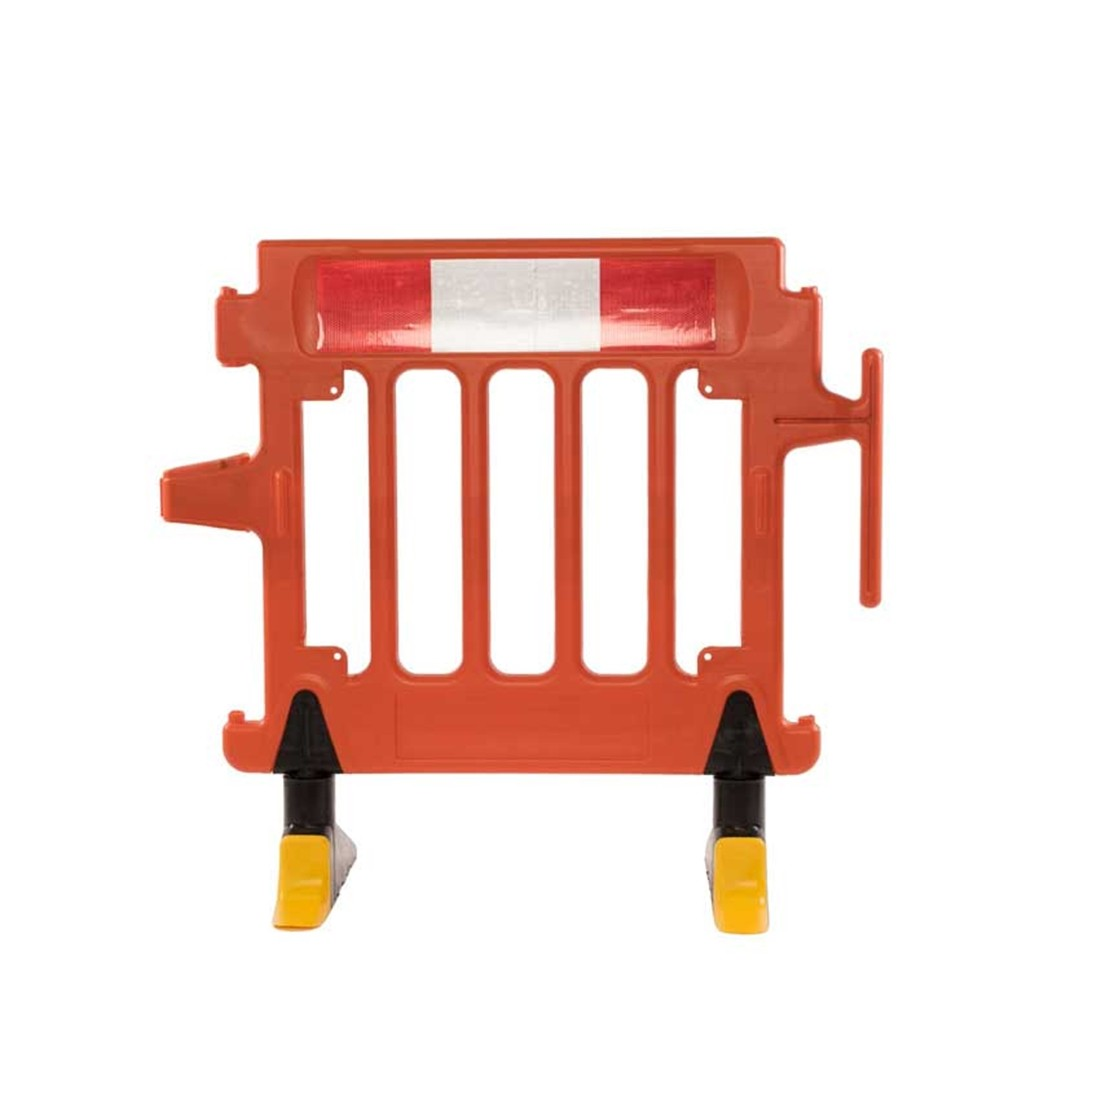 Avalon pedestrian utility construction safety plastic